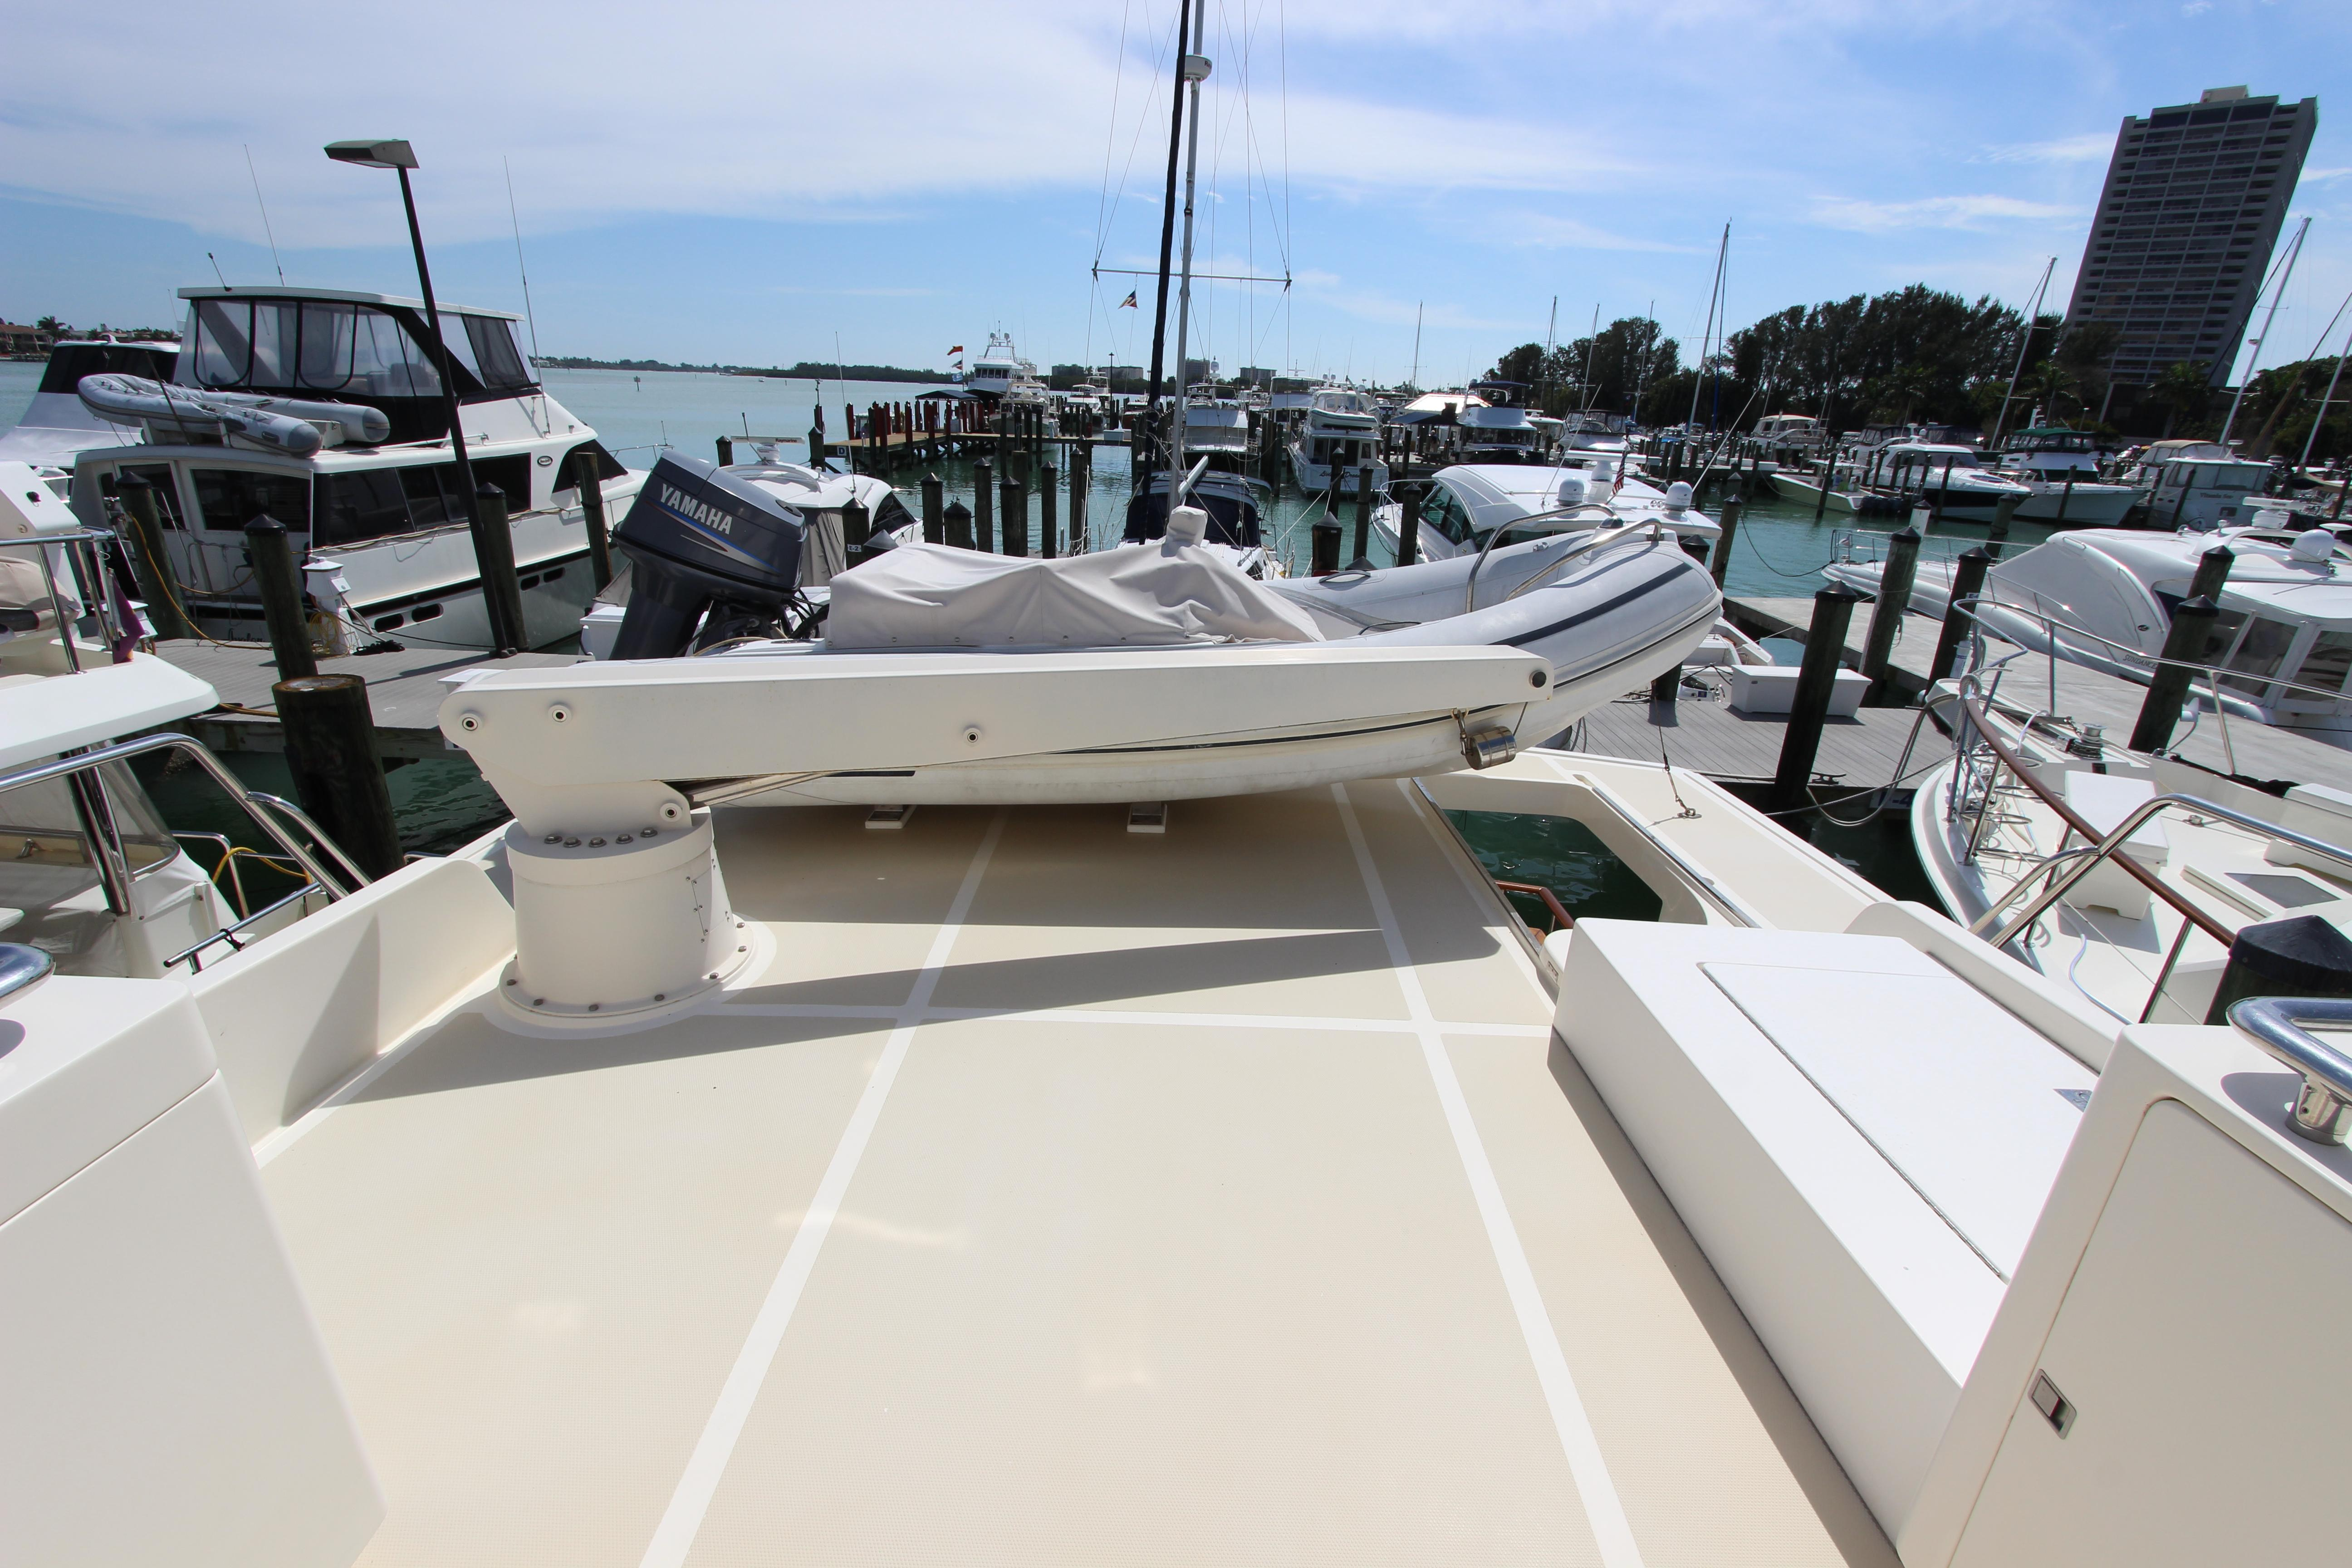 Boat Deck W/Dinghy & Crane